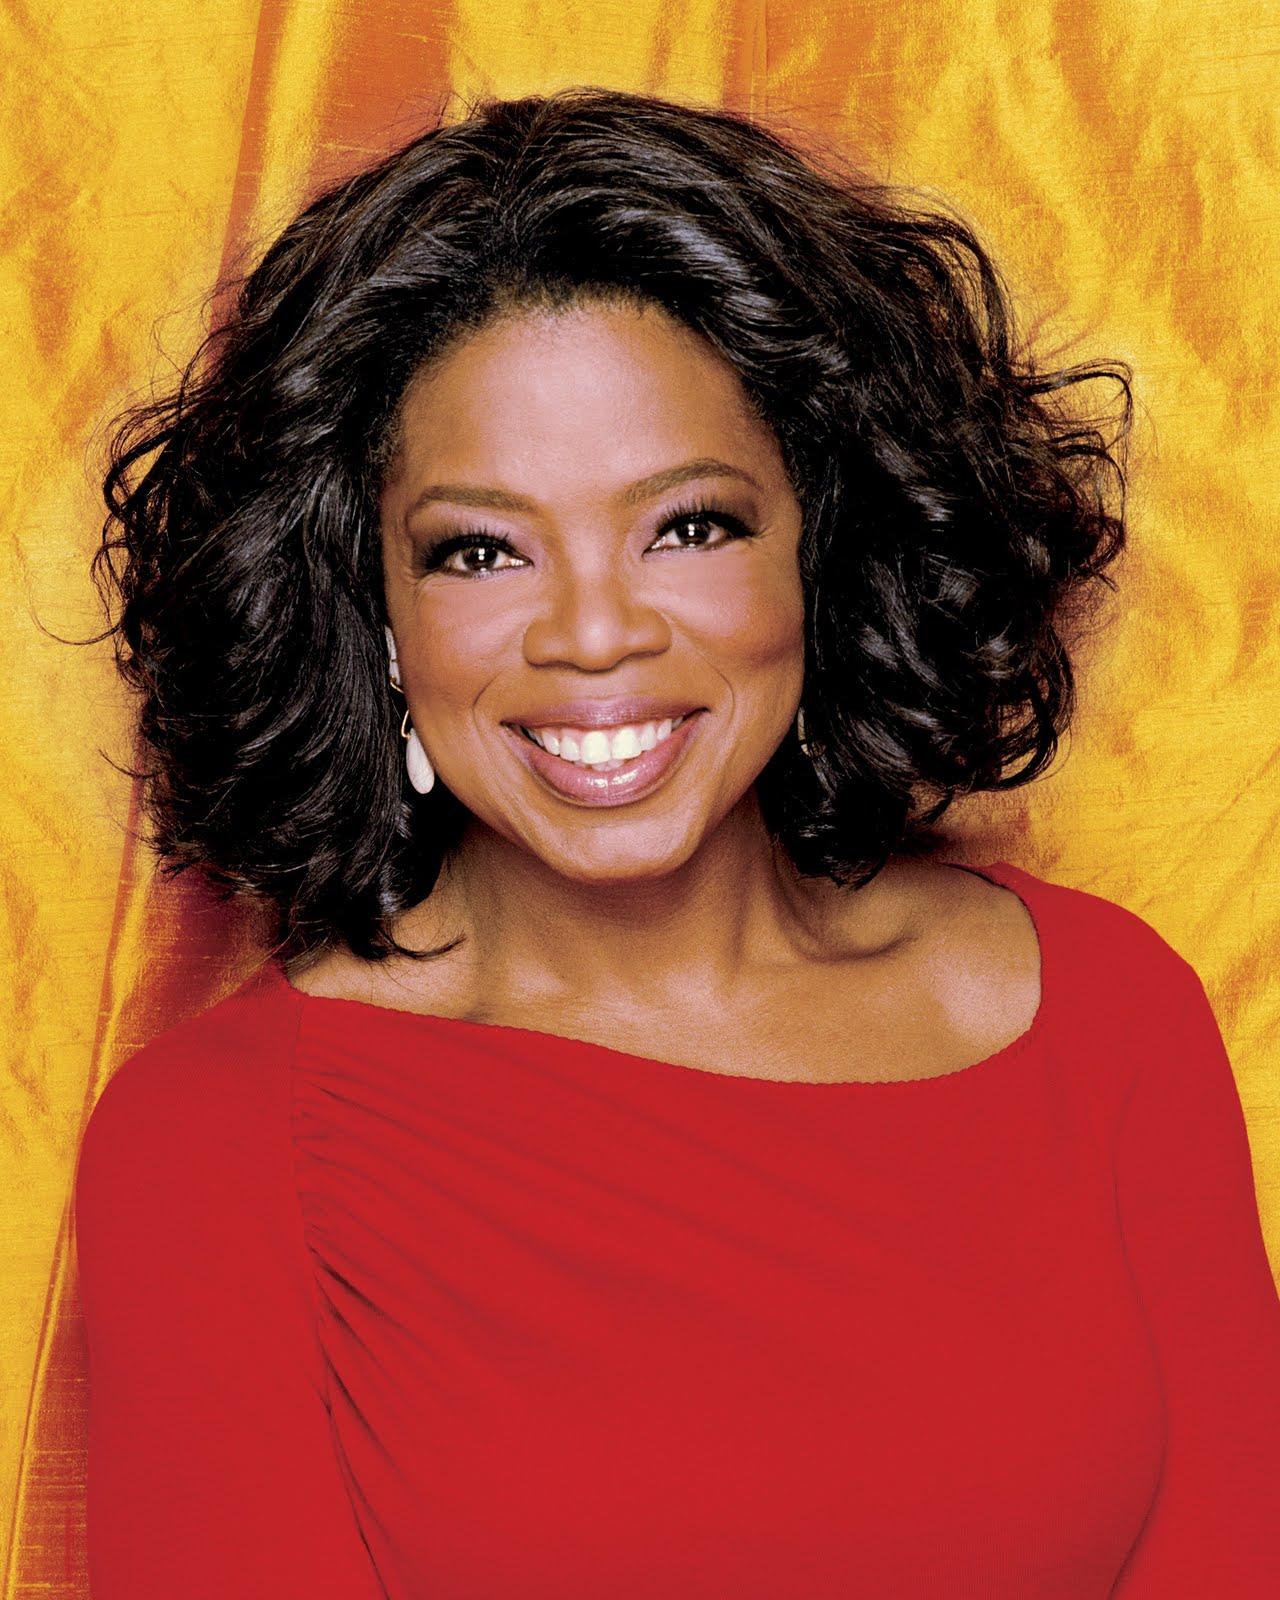 Oprah: Hot Bio Celebrity Pictures: Oprah Winfrey HD Wallpapers 2013